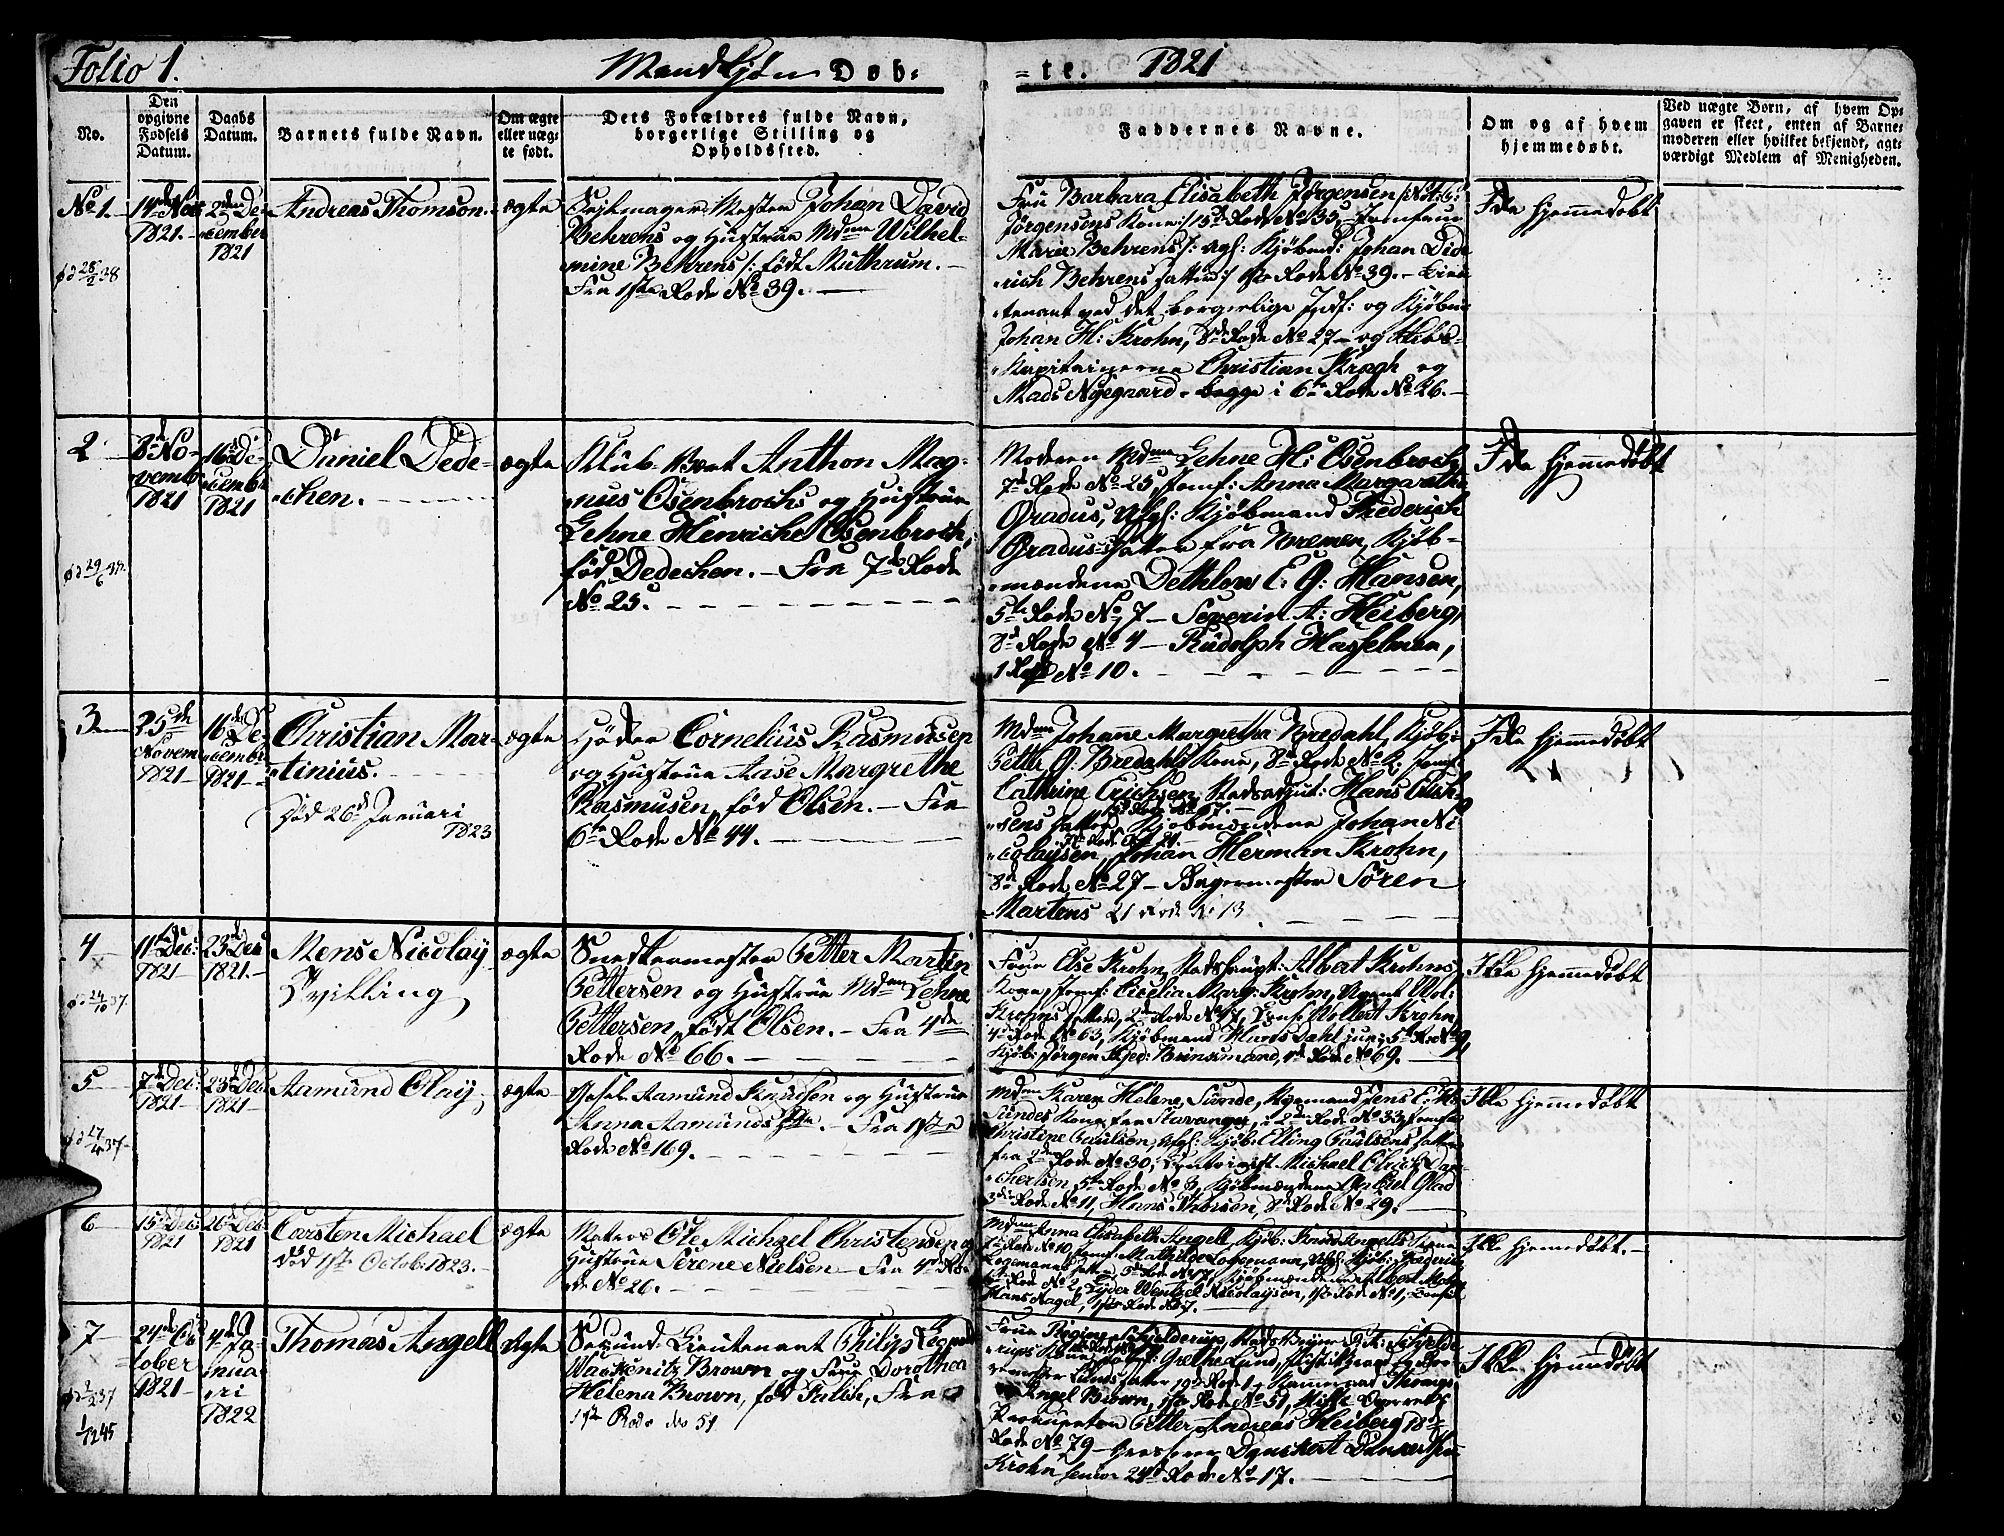 SAB, Nykirken Sokneprestembete, H/Hab: Klokkerbok nr. A 5I, 1821-1841, s. 1